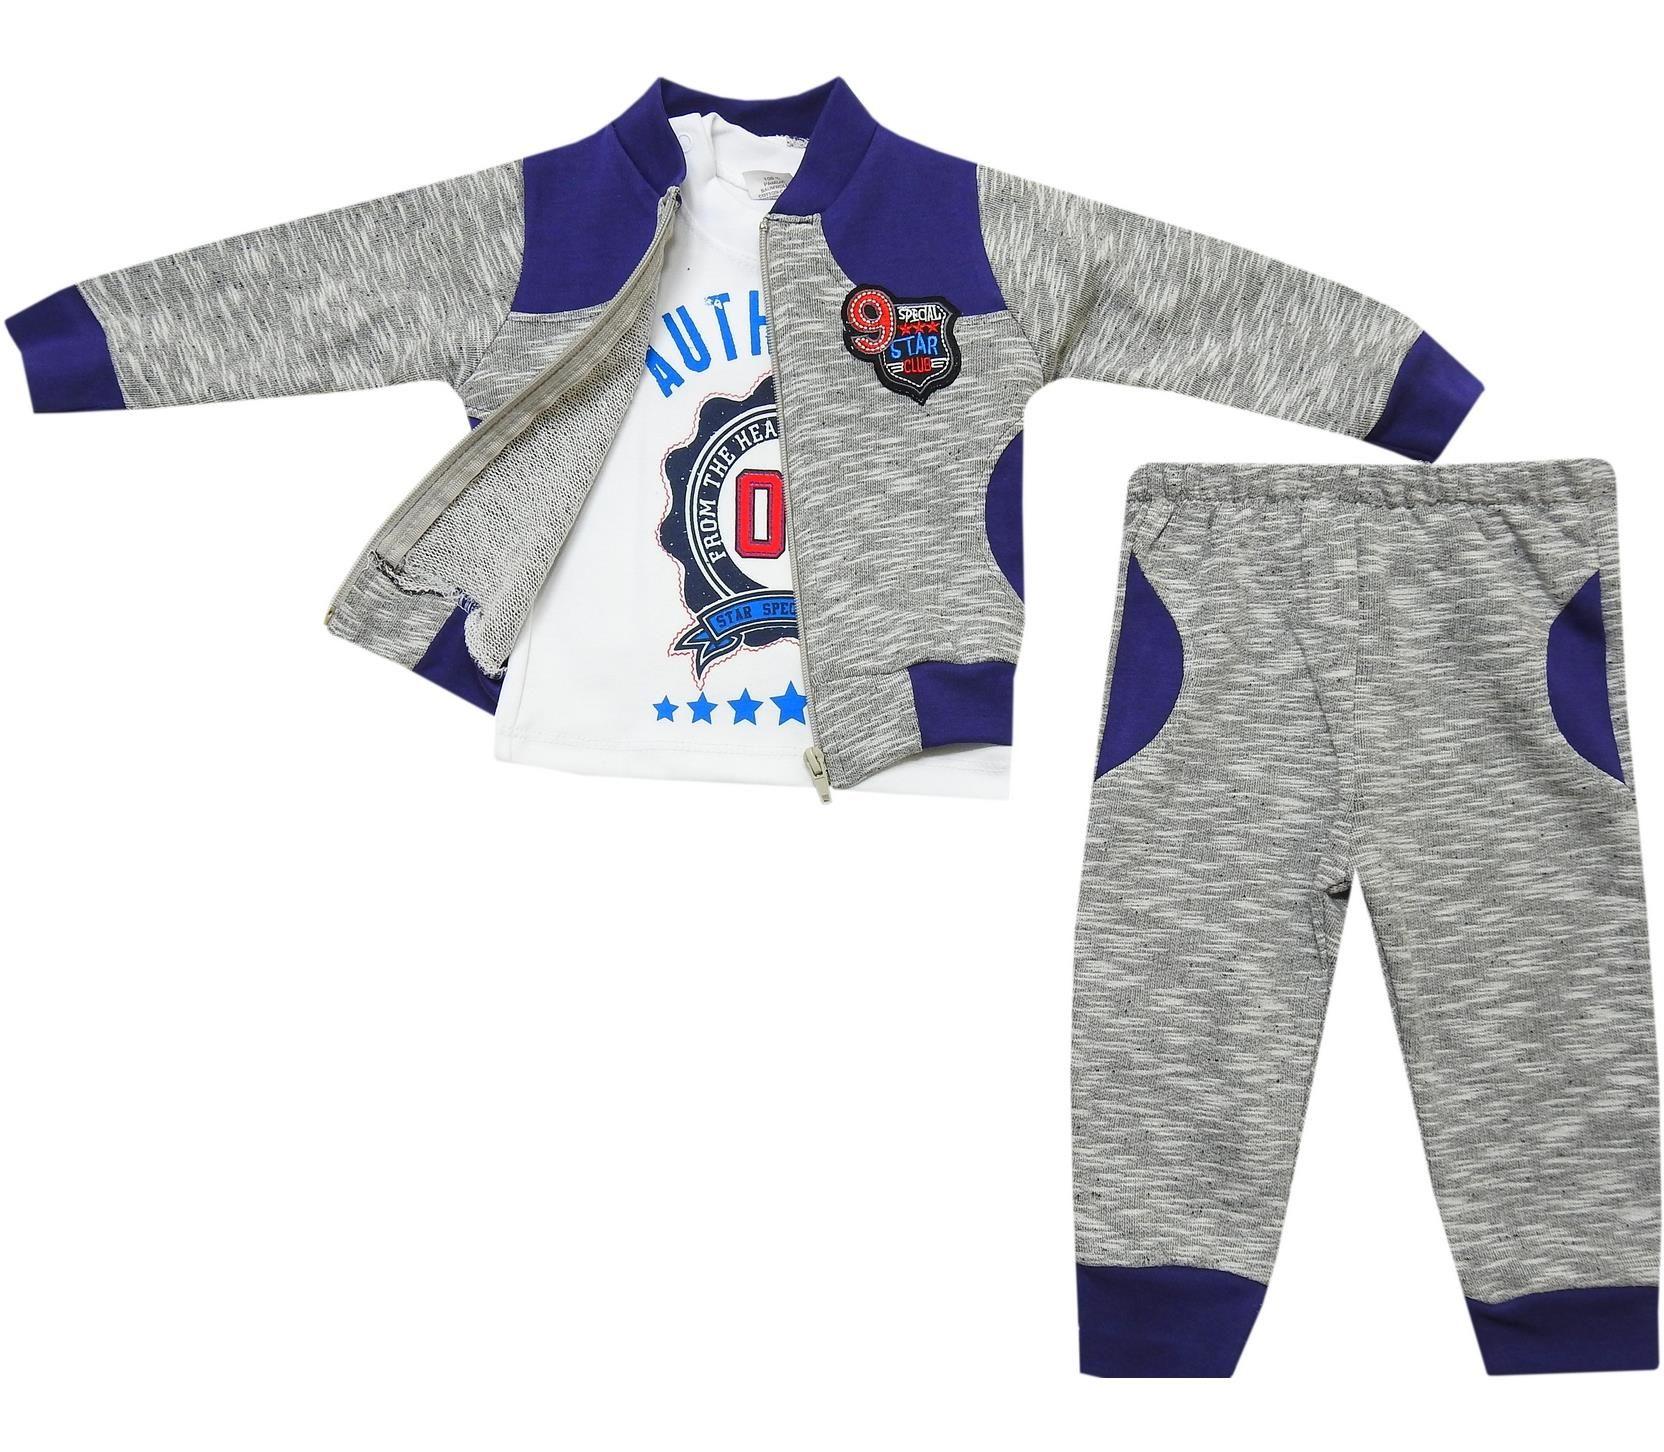 53 Wholesale t shirt jacket and trouser suit set for boy 1 2 age